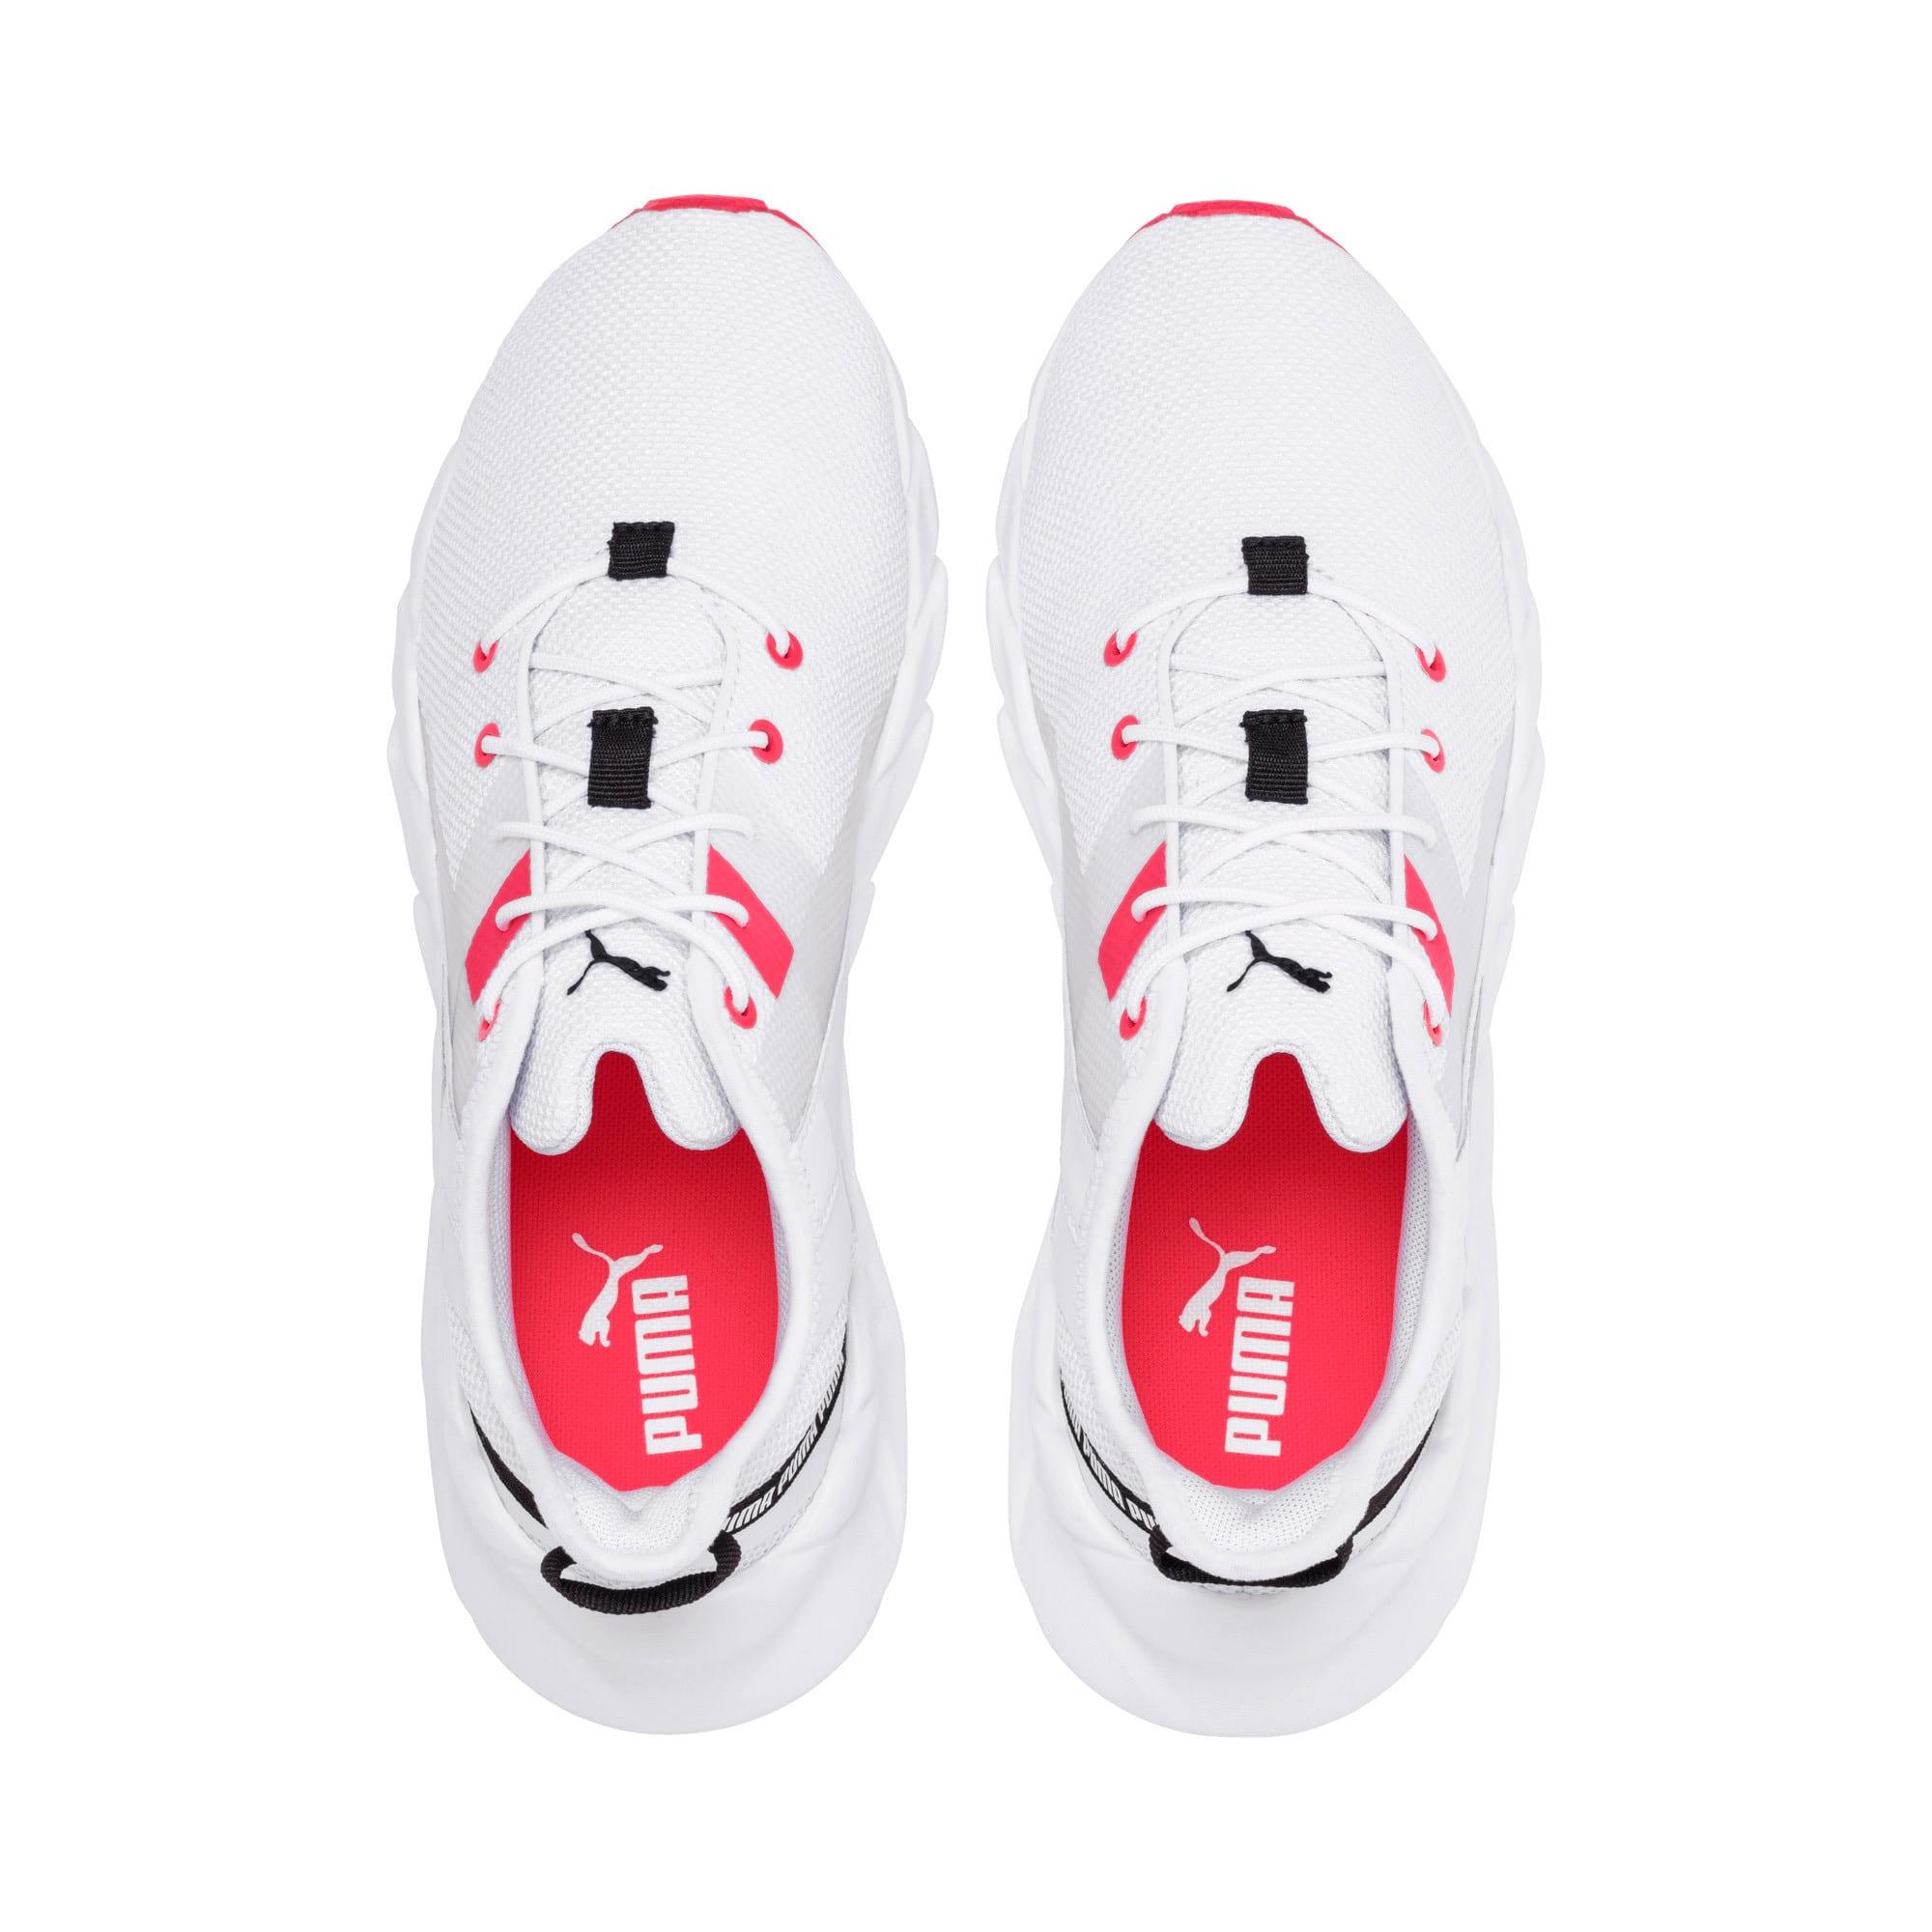 Thumbnail 7 of Weave XT Women's Training Shoes, Puma White-Pink Alert, medium